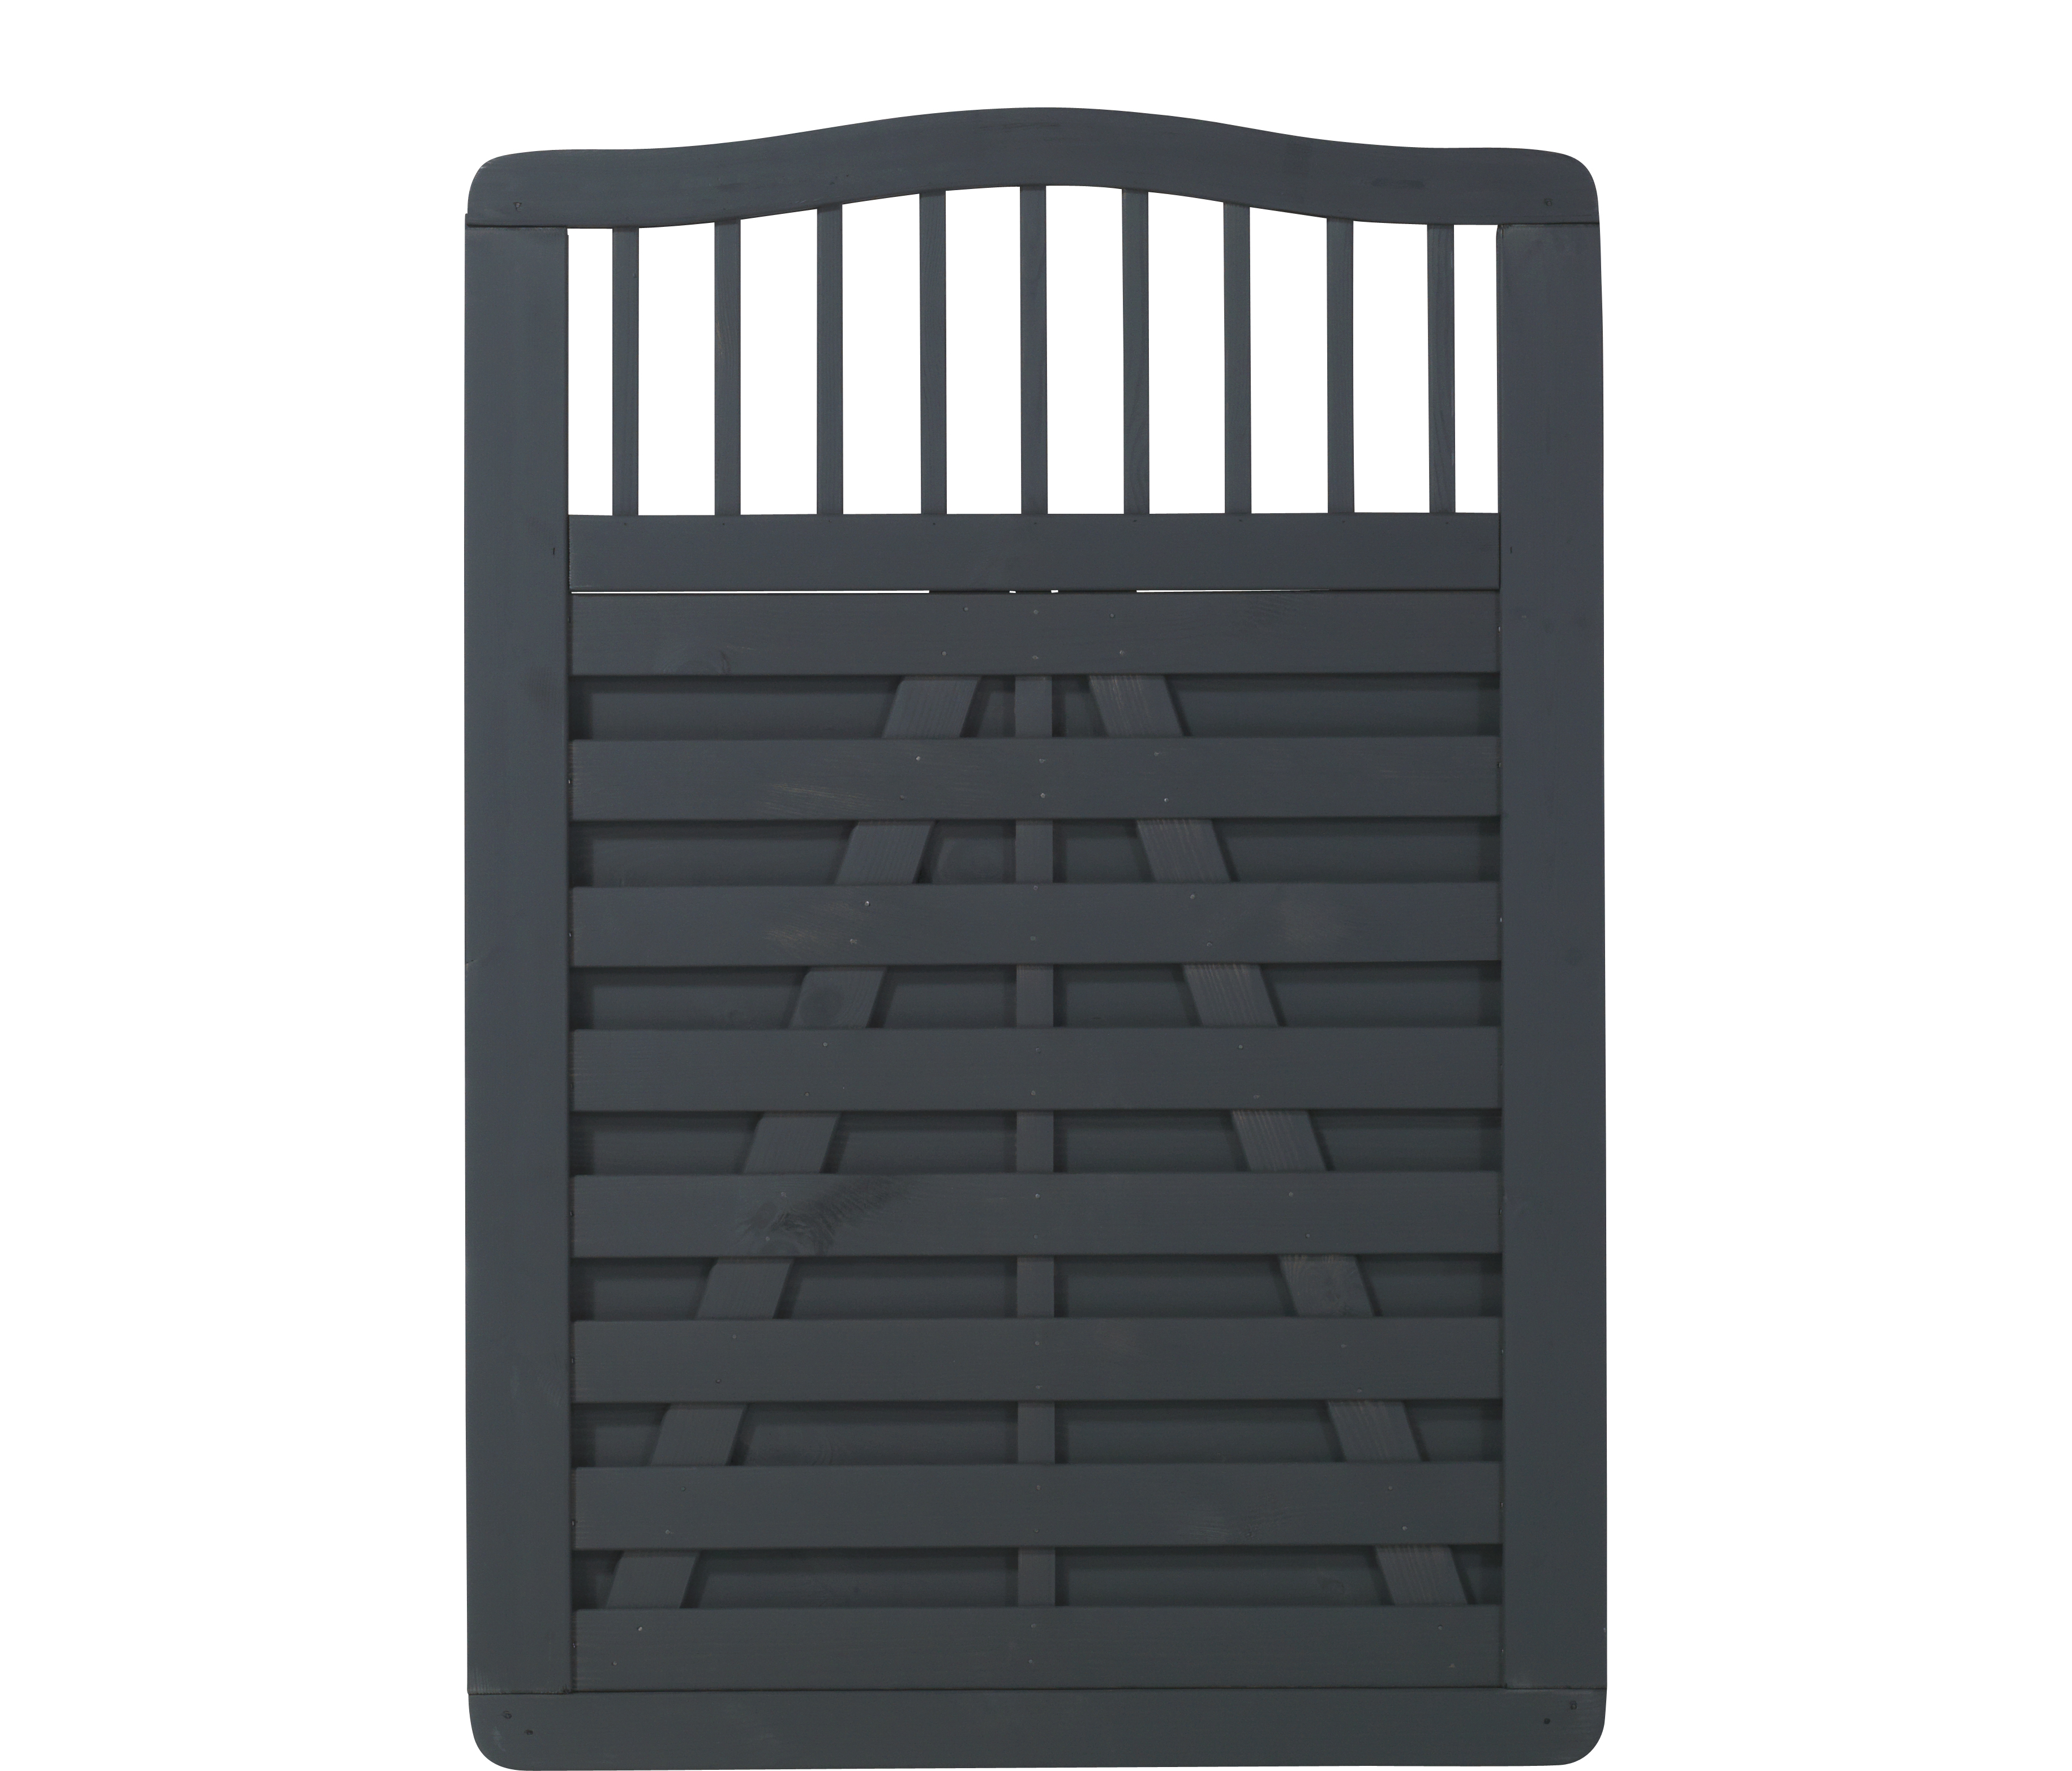 DK Plus | Rondo poort 100x142 | Antraciet